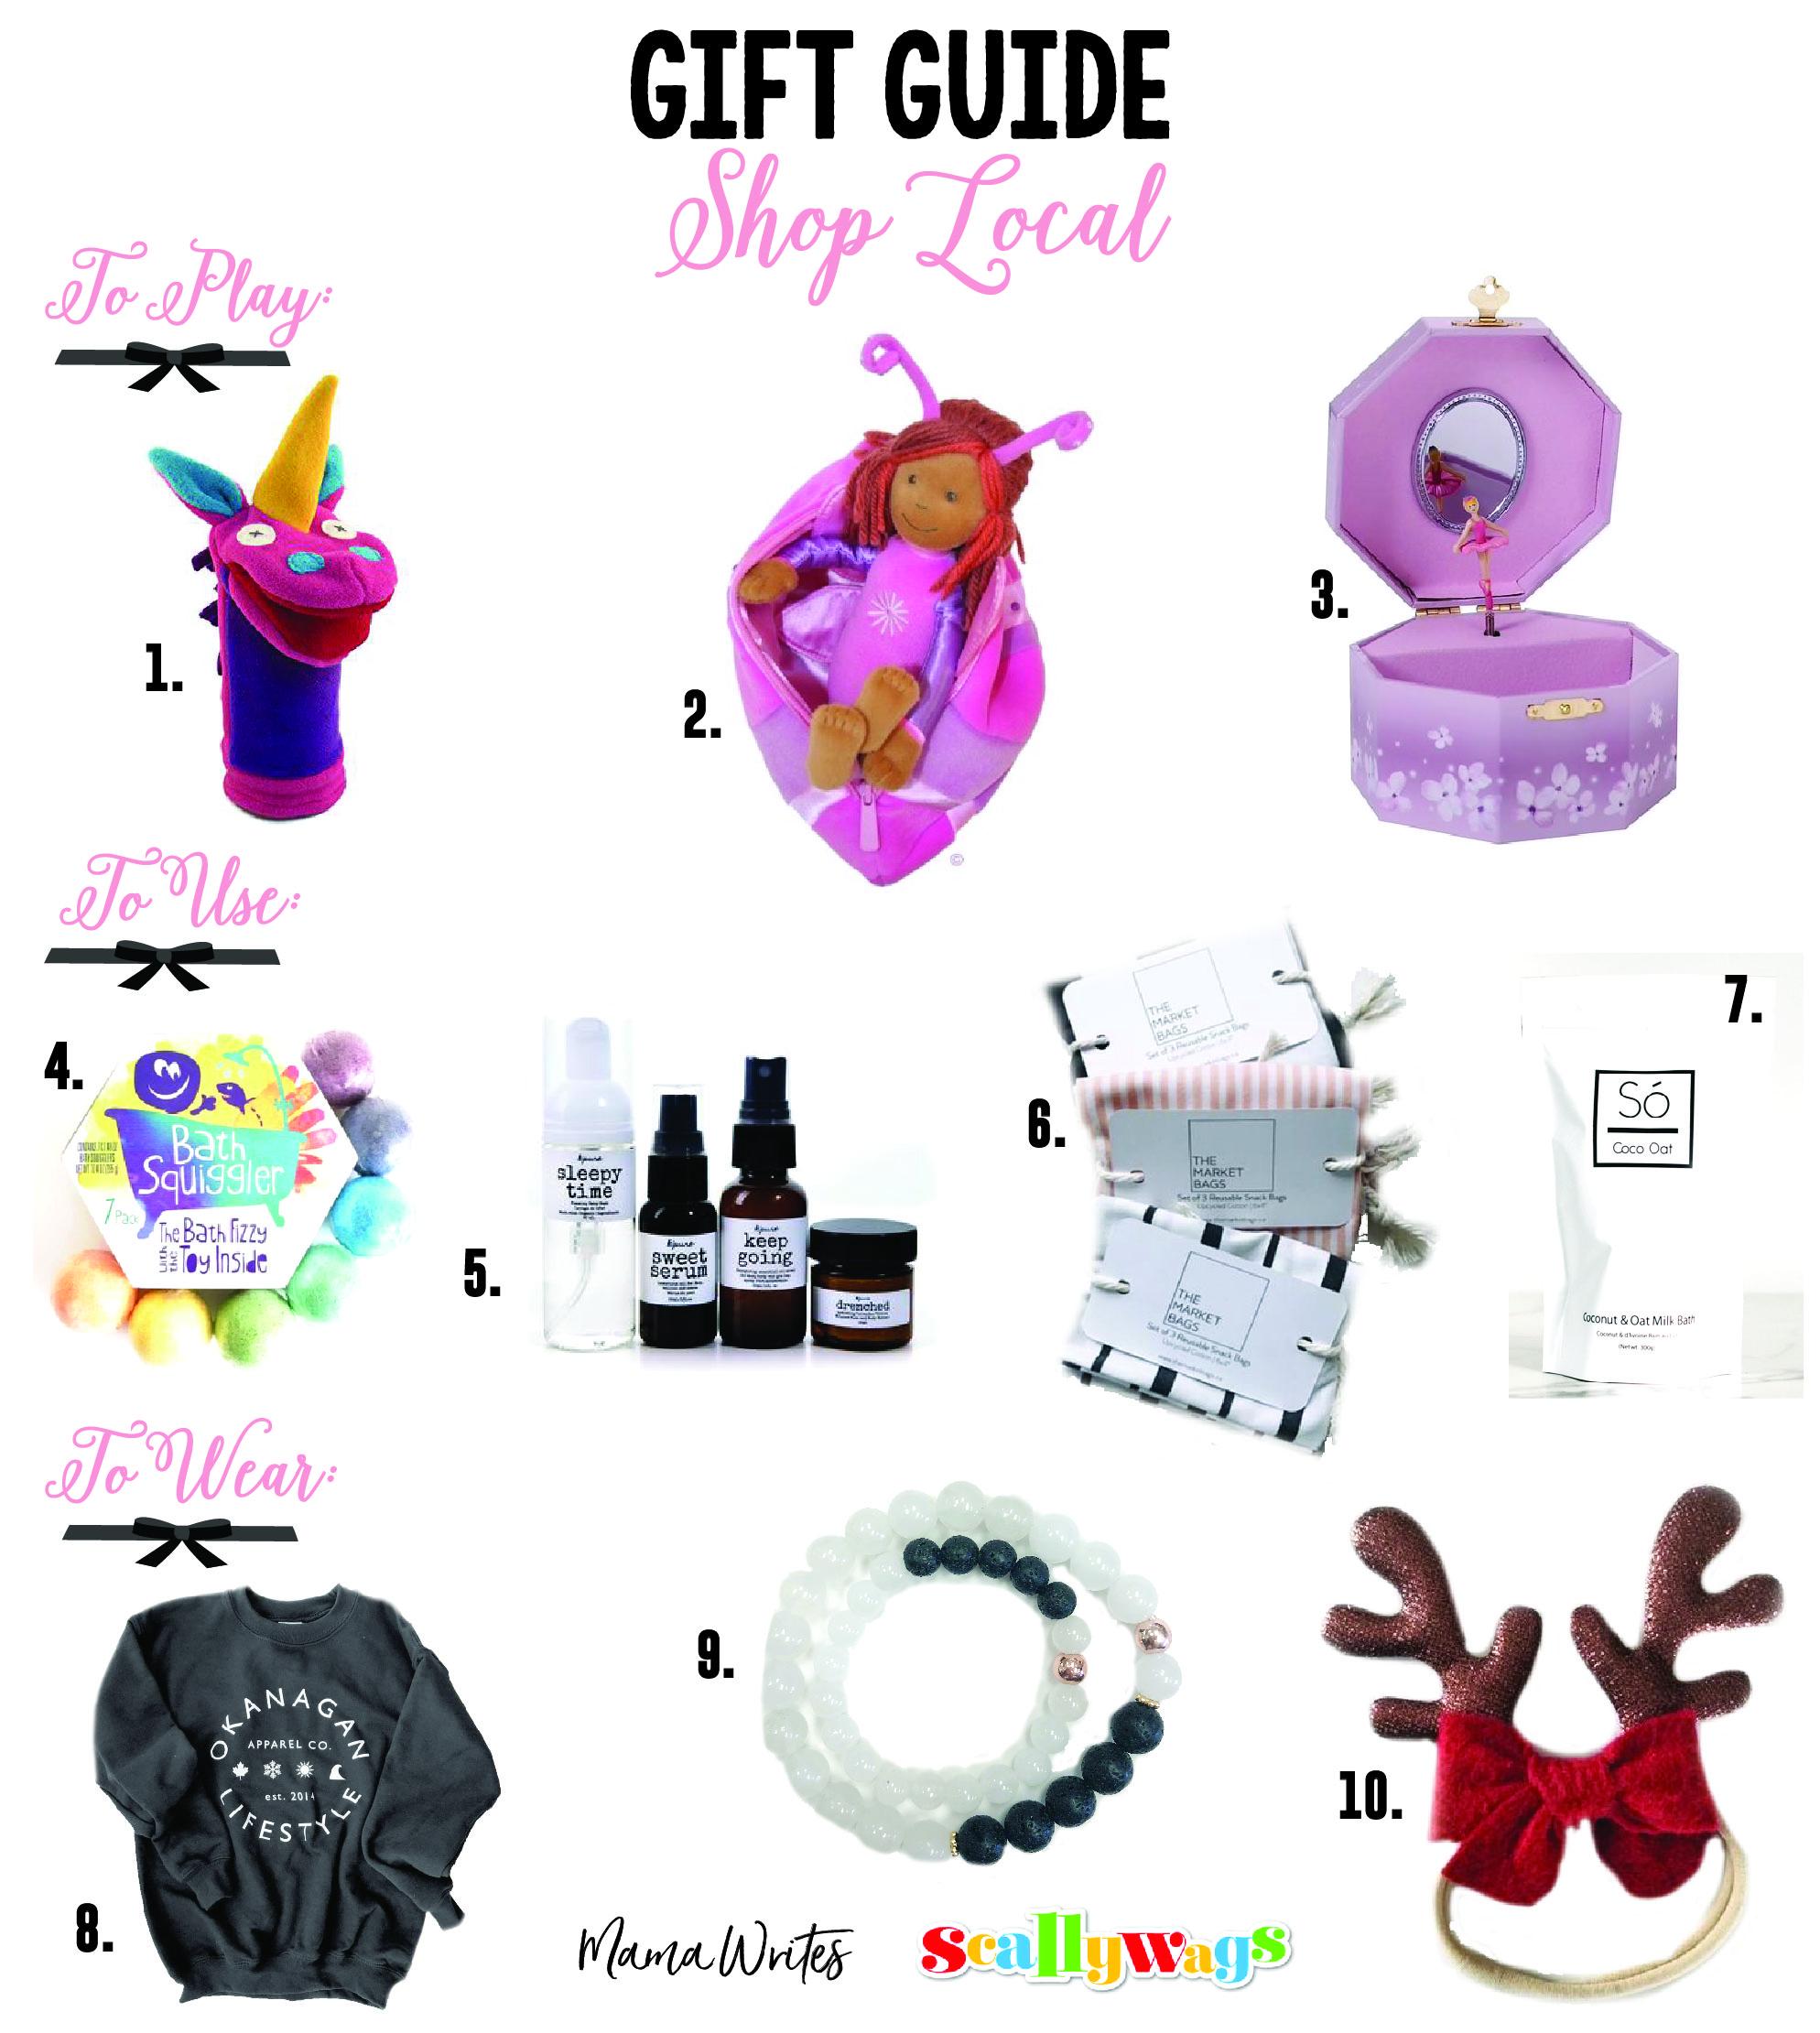 Kelowna Shop Local Gift Guide